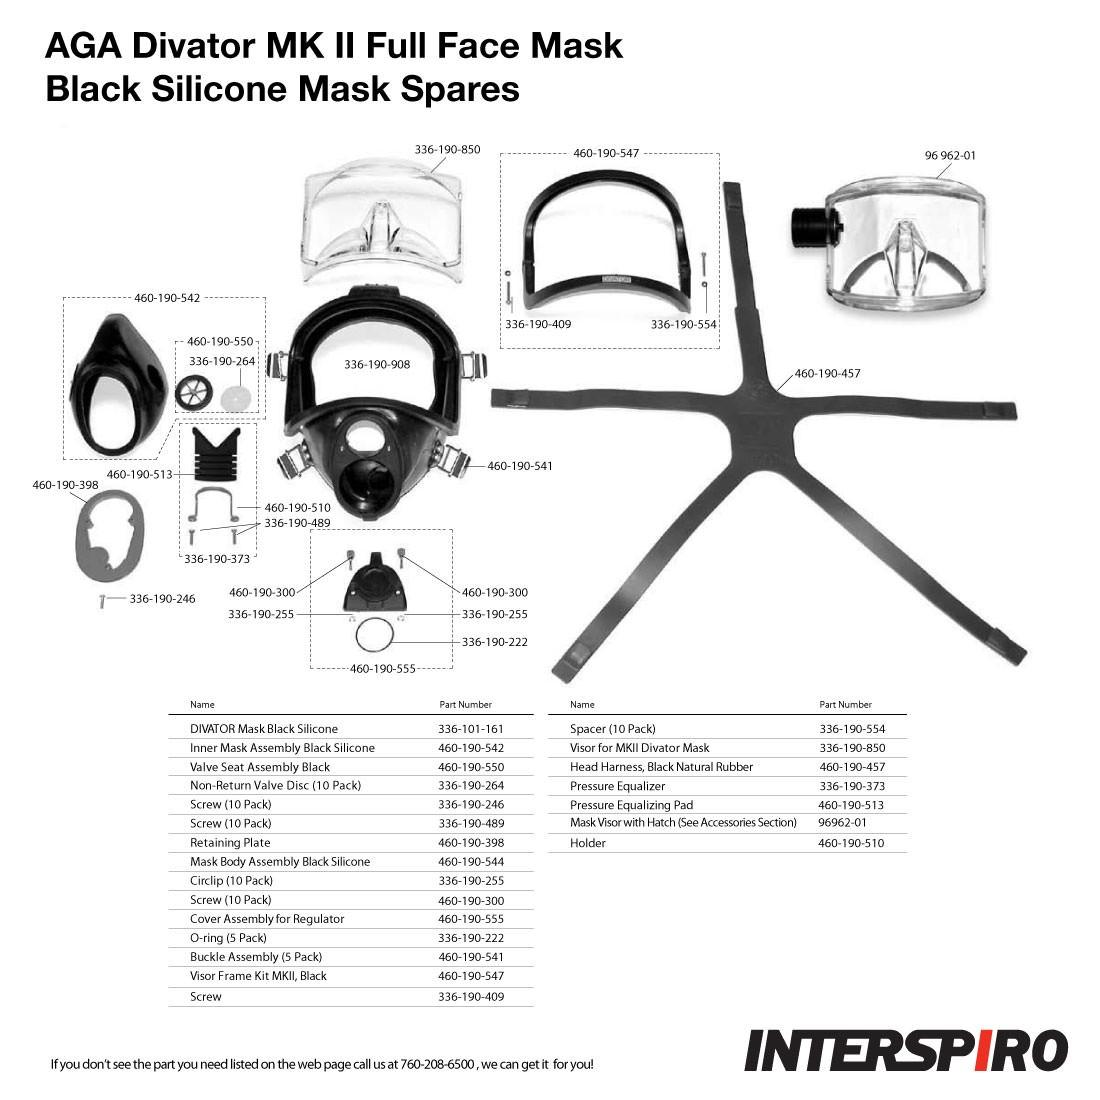 Interspiro Aga Divator Mk Ii Full Face Mask With Positive